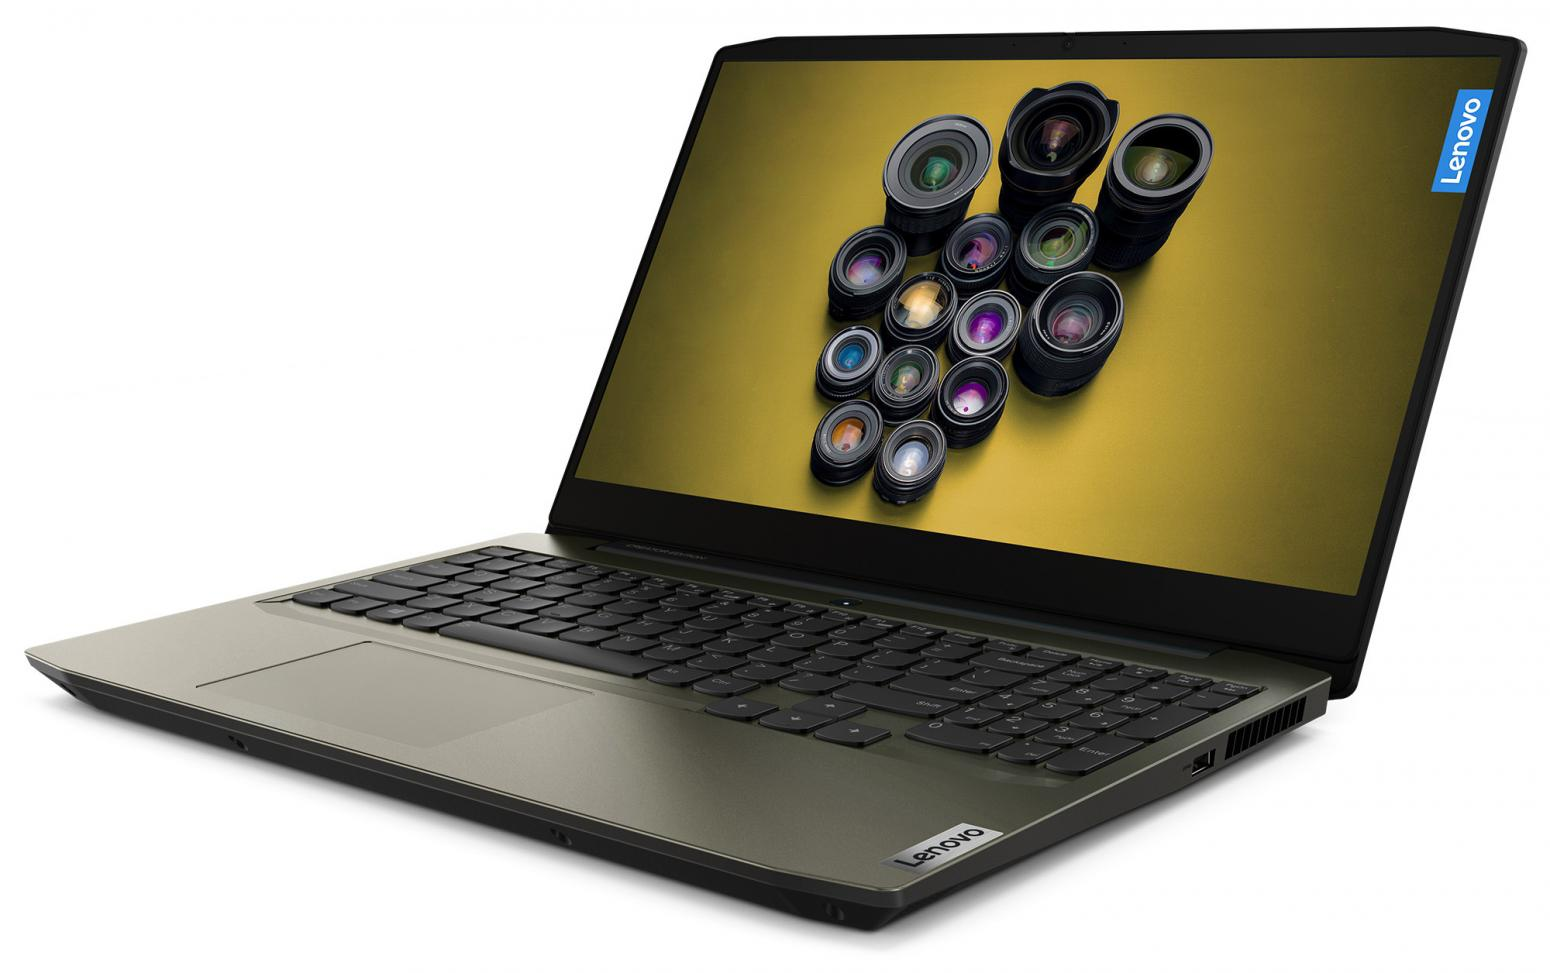 Ordinateur portable Lenovo  IdeaPad Creator 5 15IMH05 (82D4004WFR) Vert Kaki - GTX 1650 Ti, 144Hz - photo 2